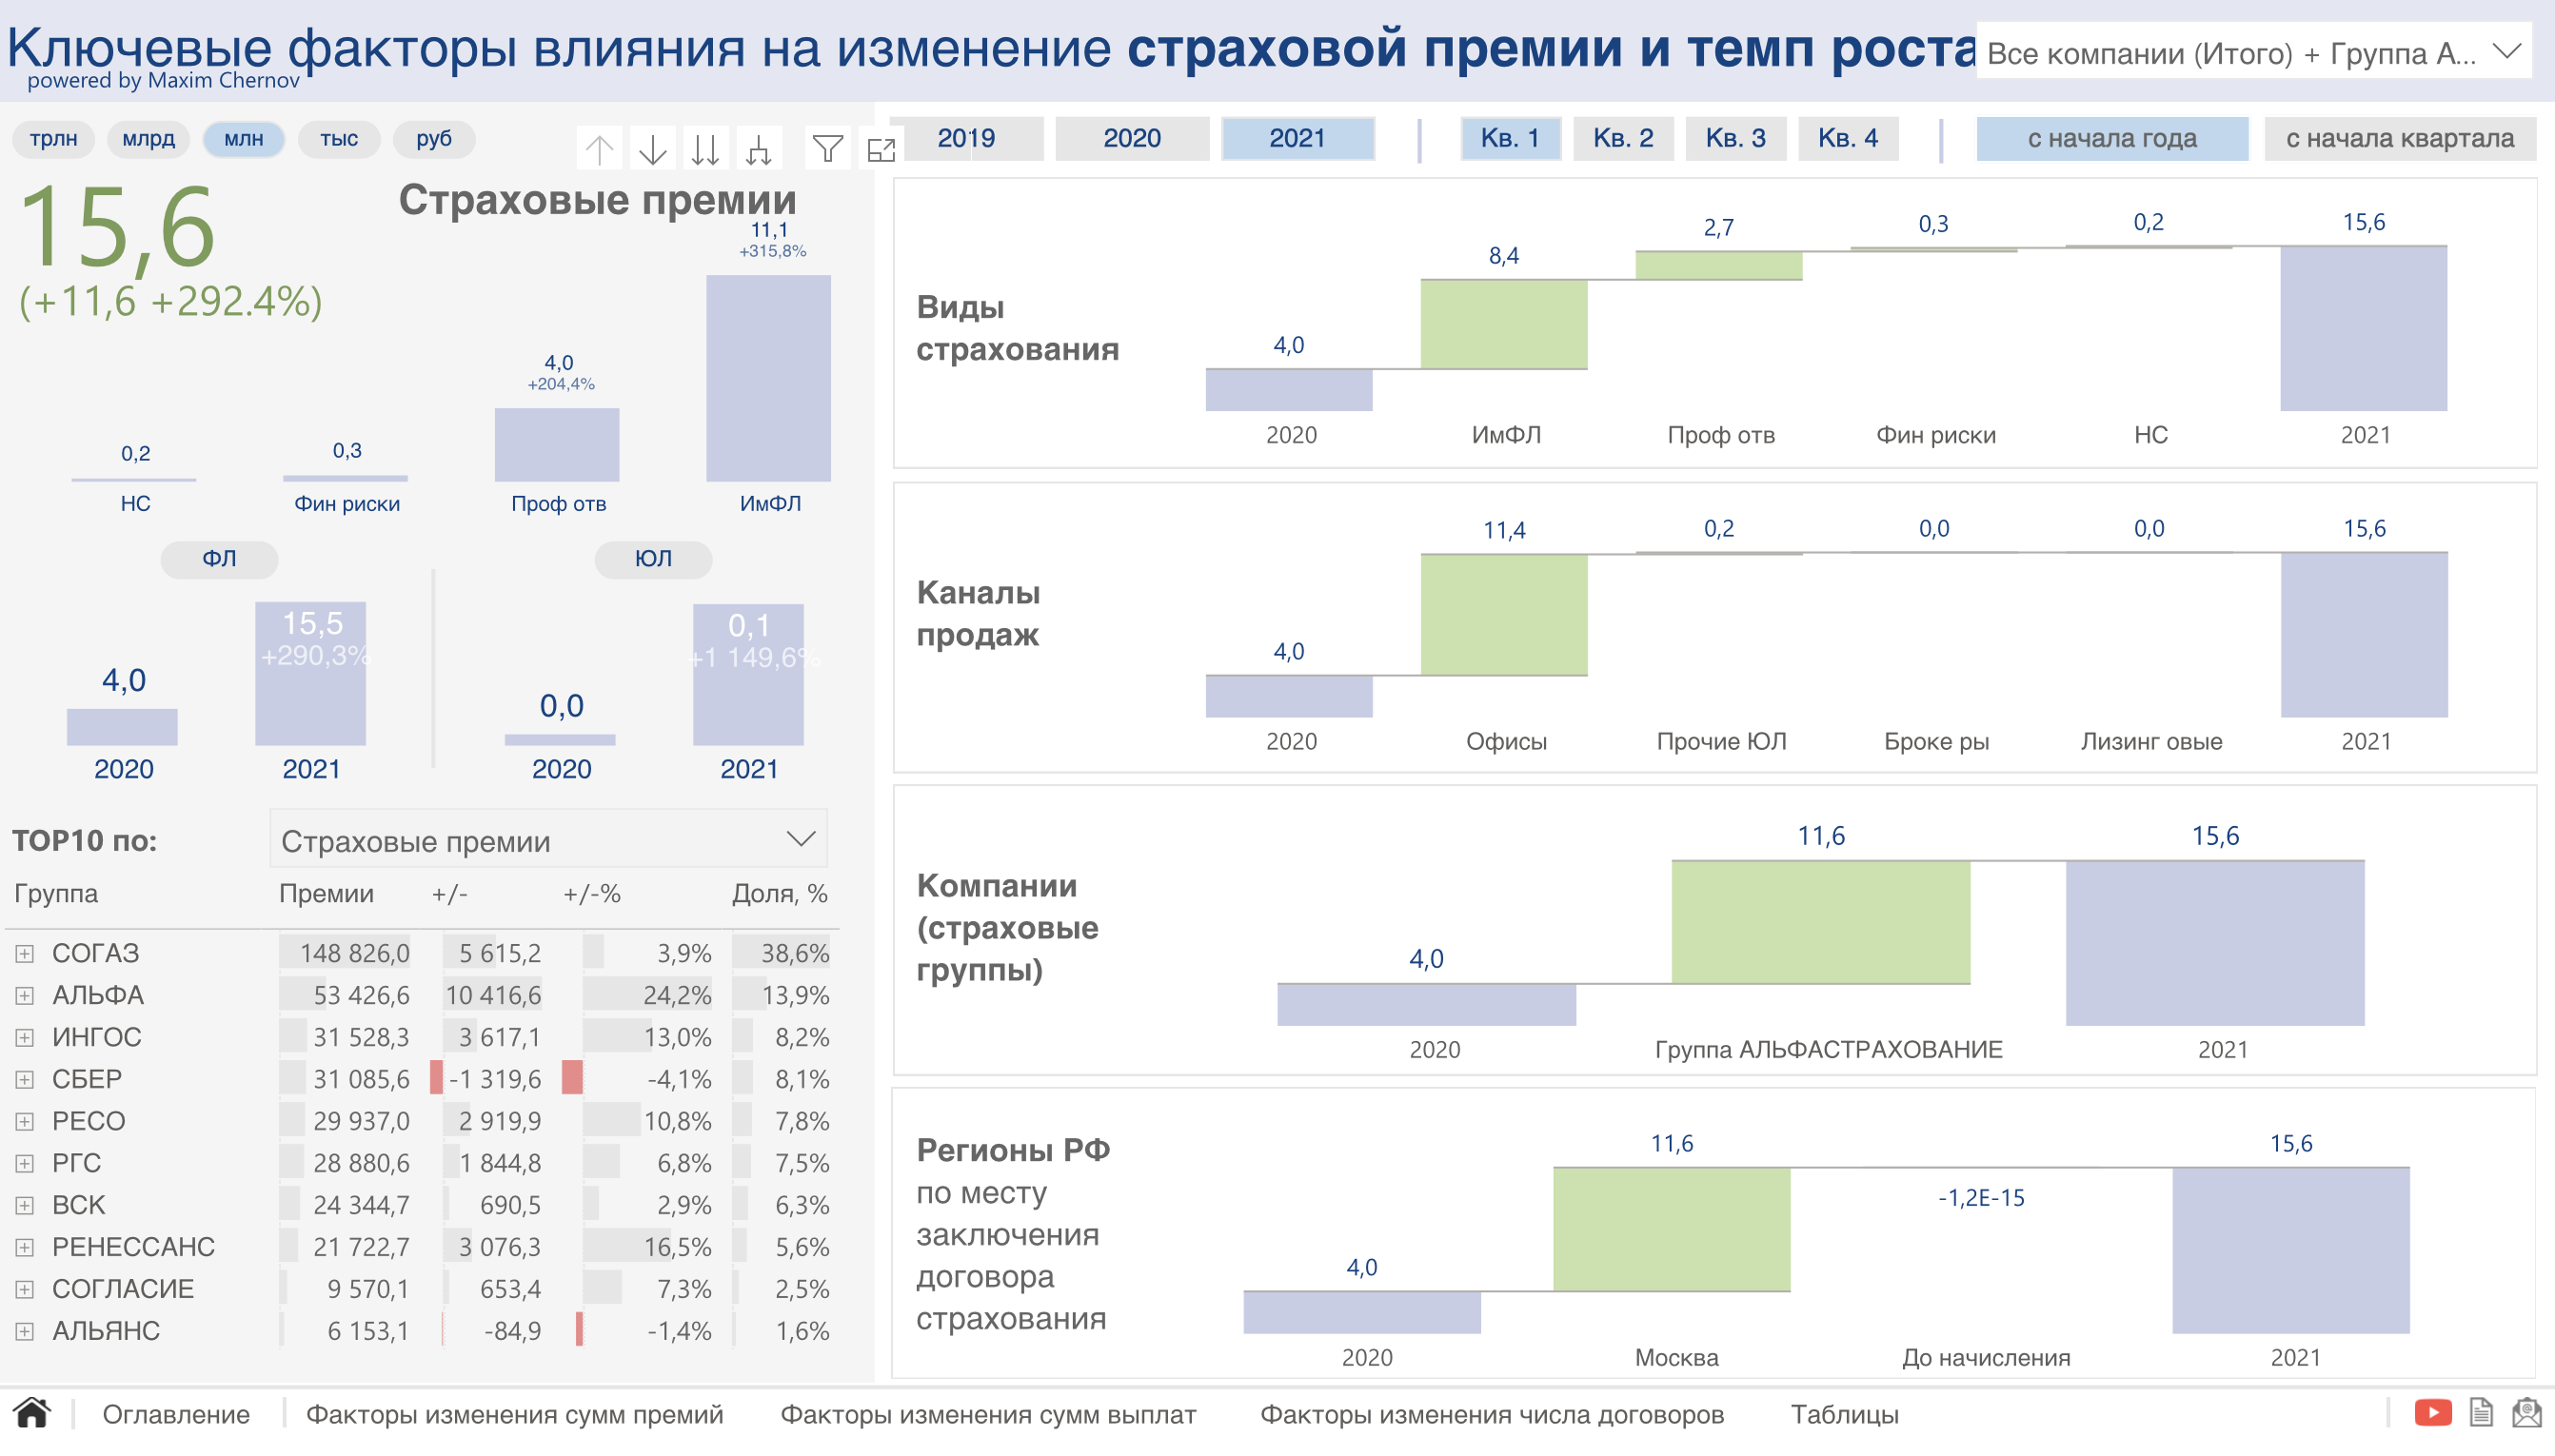 Манго наиншурили 15 млн рублей в 1 квартале 2021 года